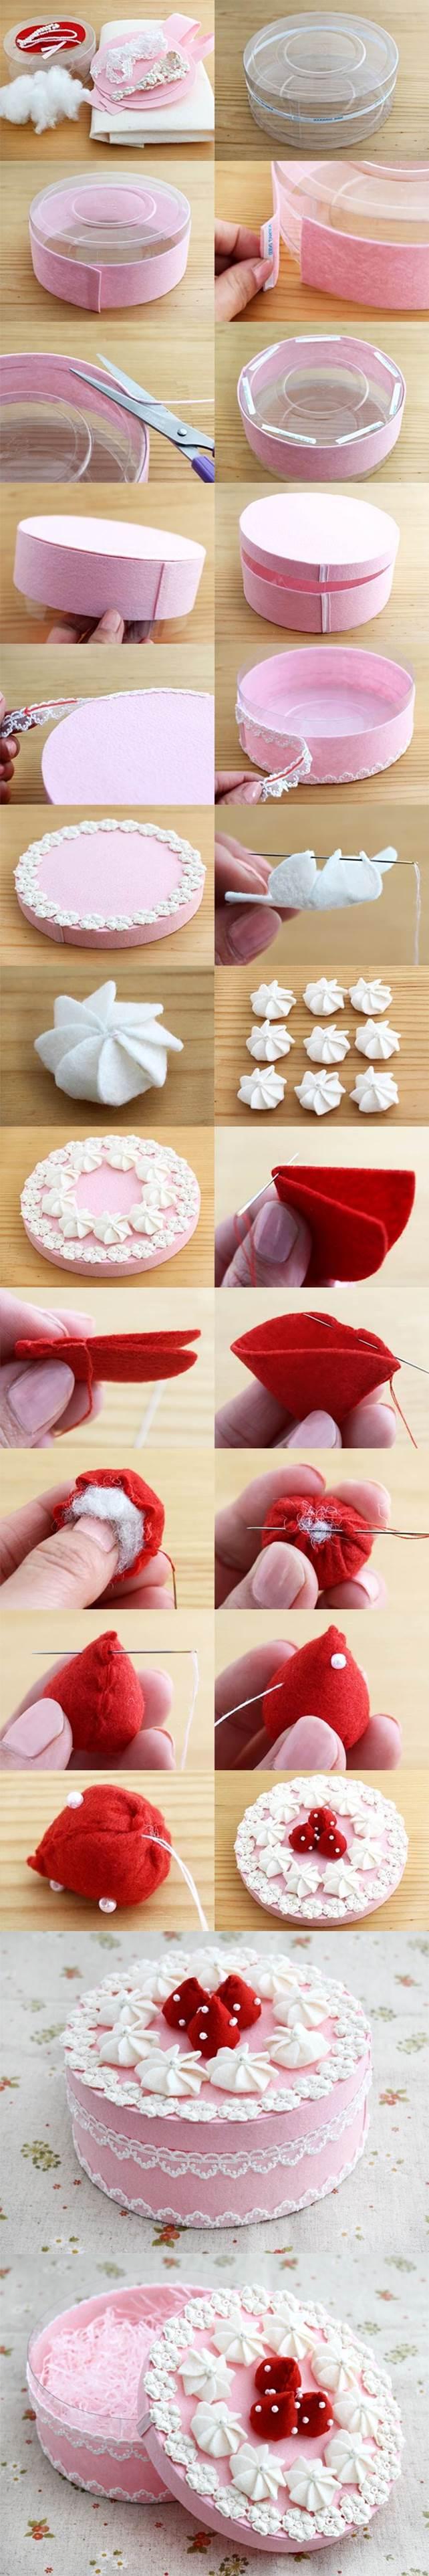 DIY Beautiful Gift Box Decorated Like a Cake 2